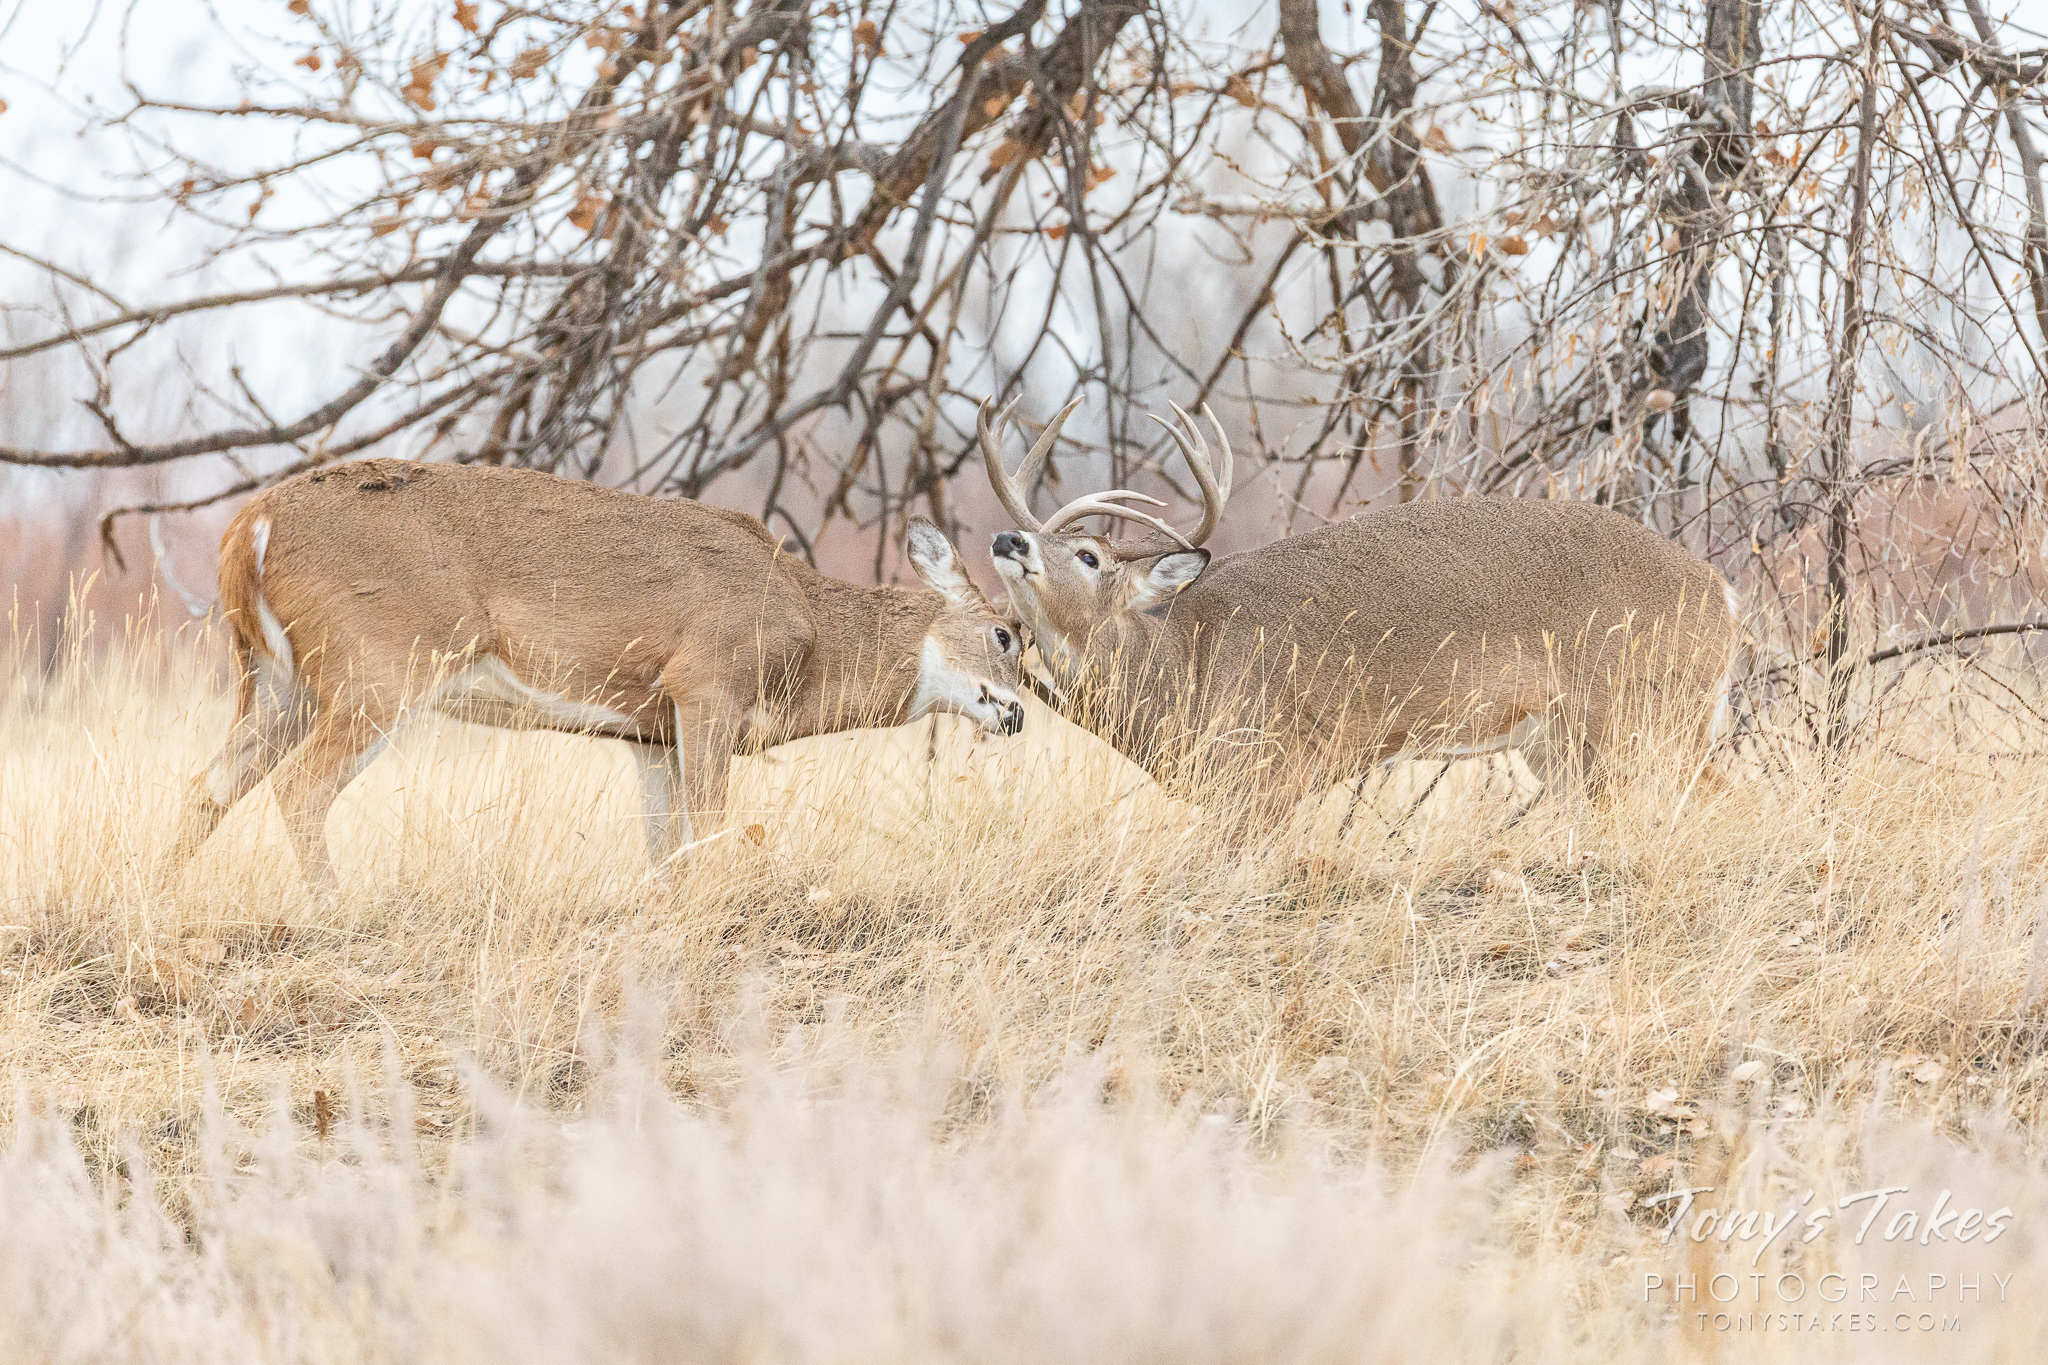 White-tailed deer bucks go head to head in Colorado. (© Tony's Takes)